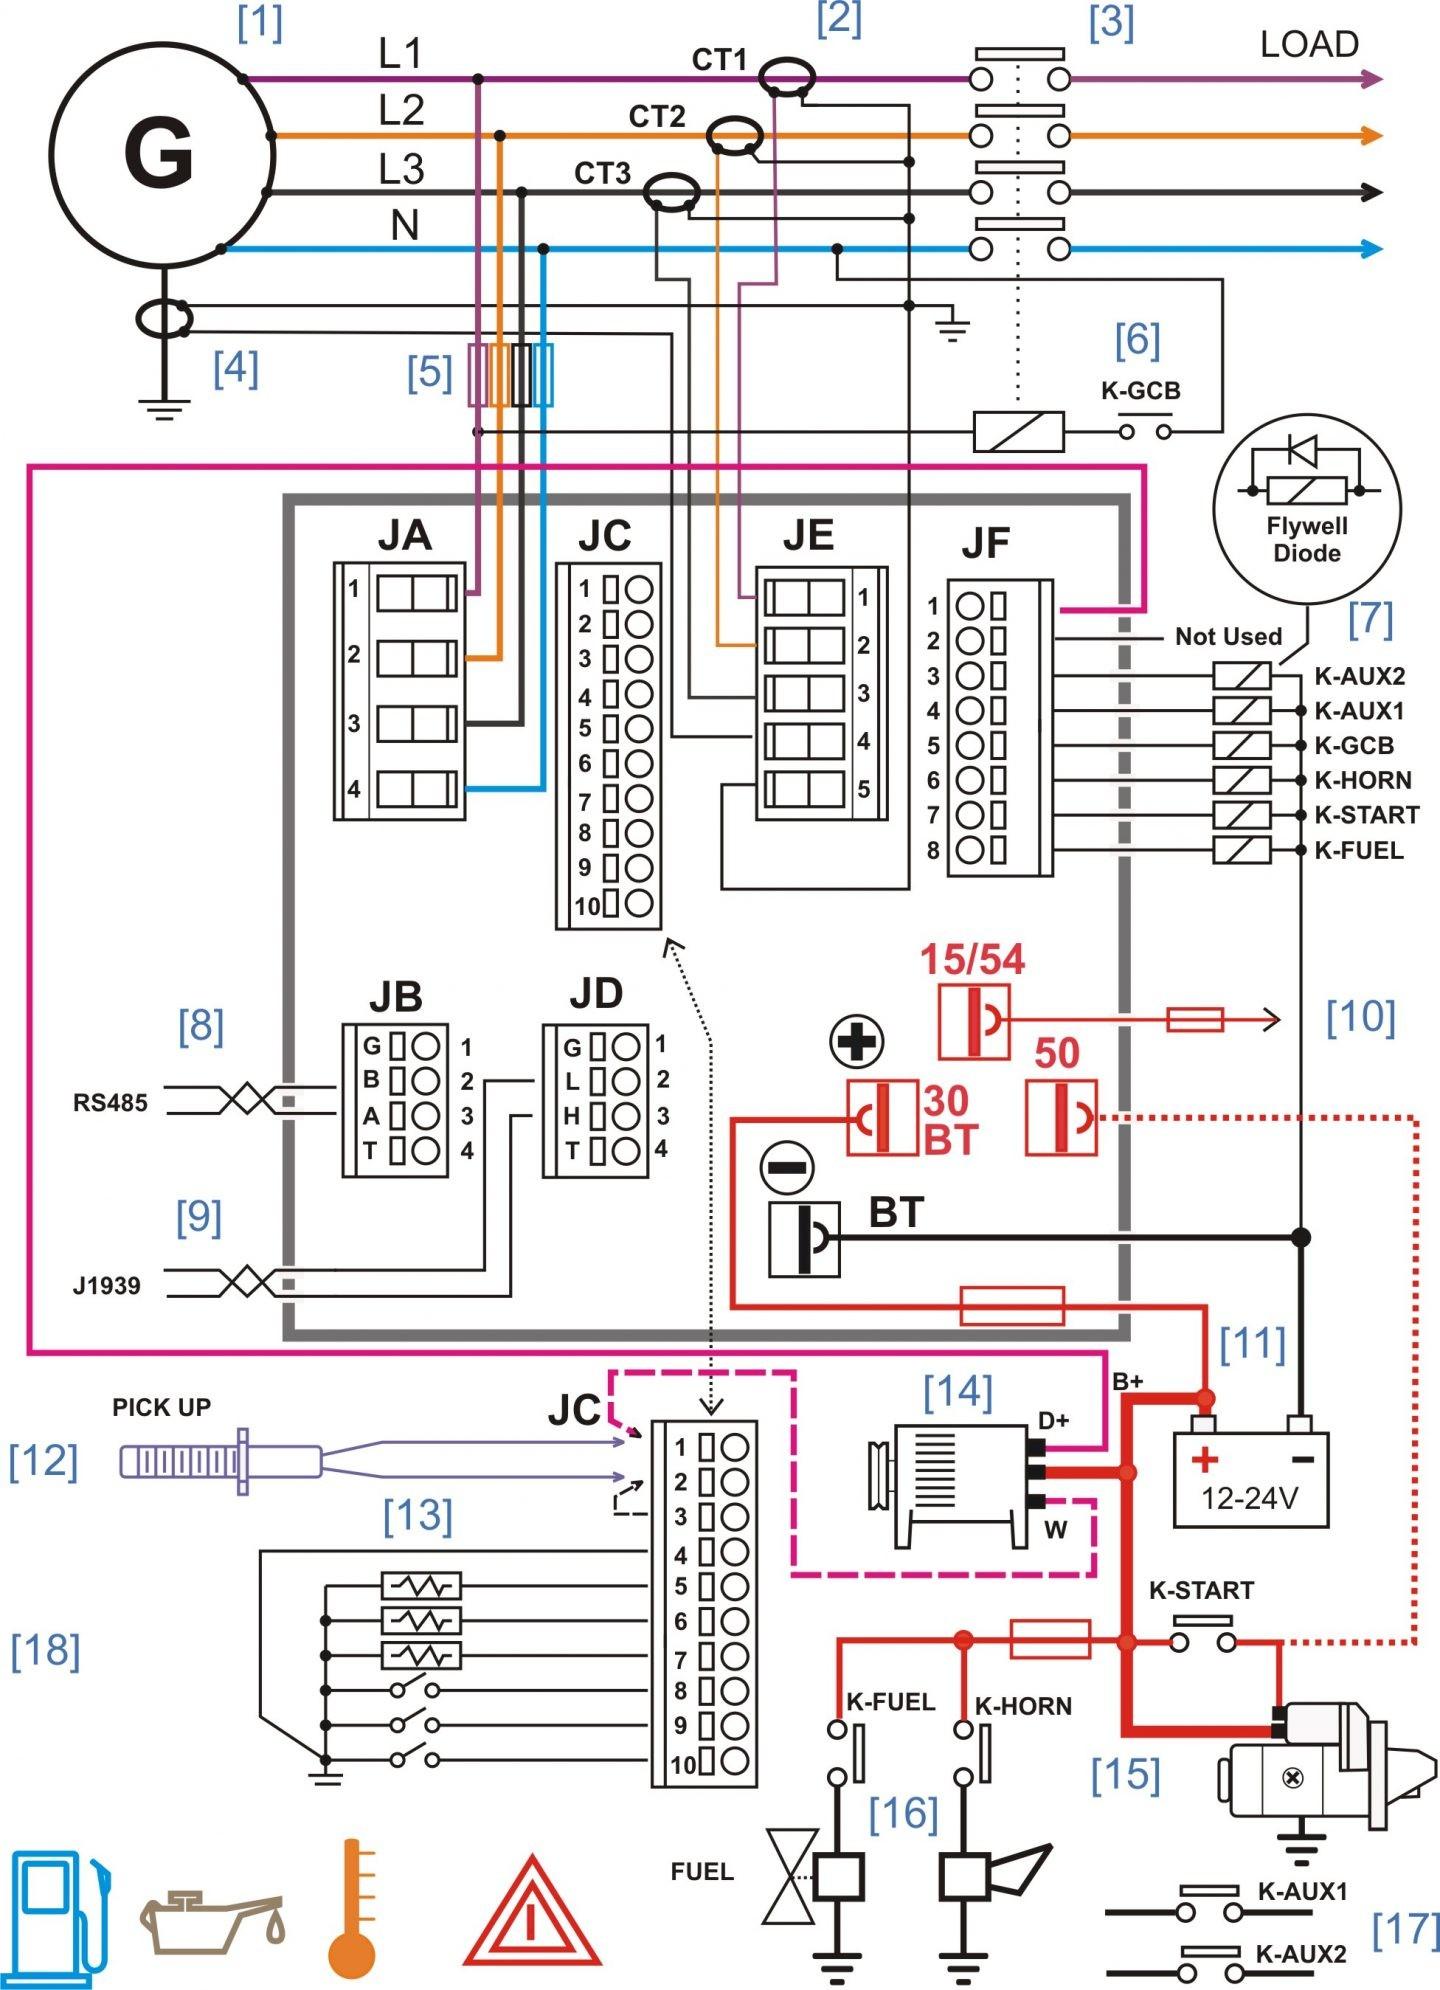 Diesel Generator Control Panel Wiring Diagram And Relay Pdfr Antenna Reverse Electric Fan Power Window Lighting